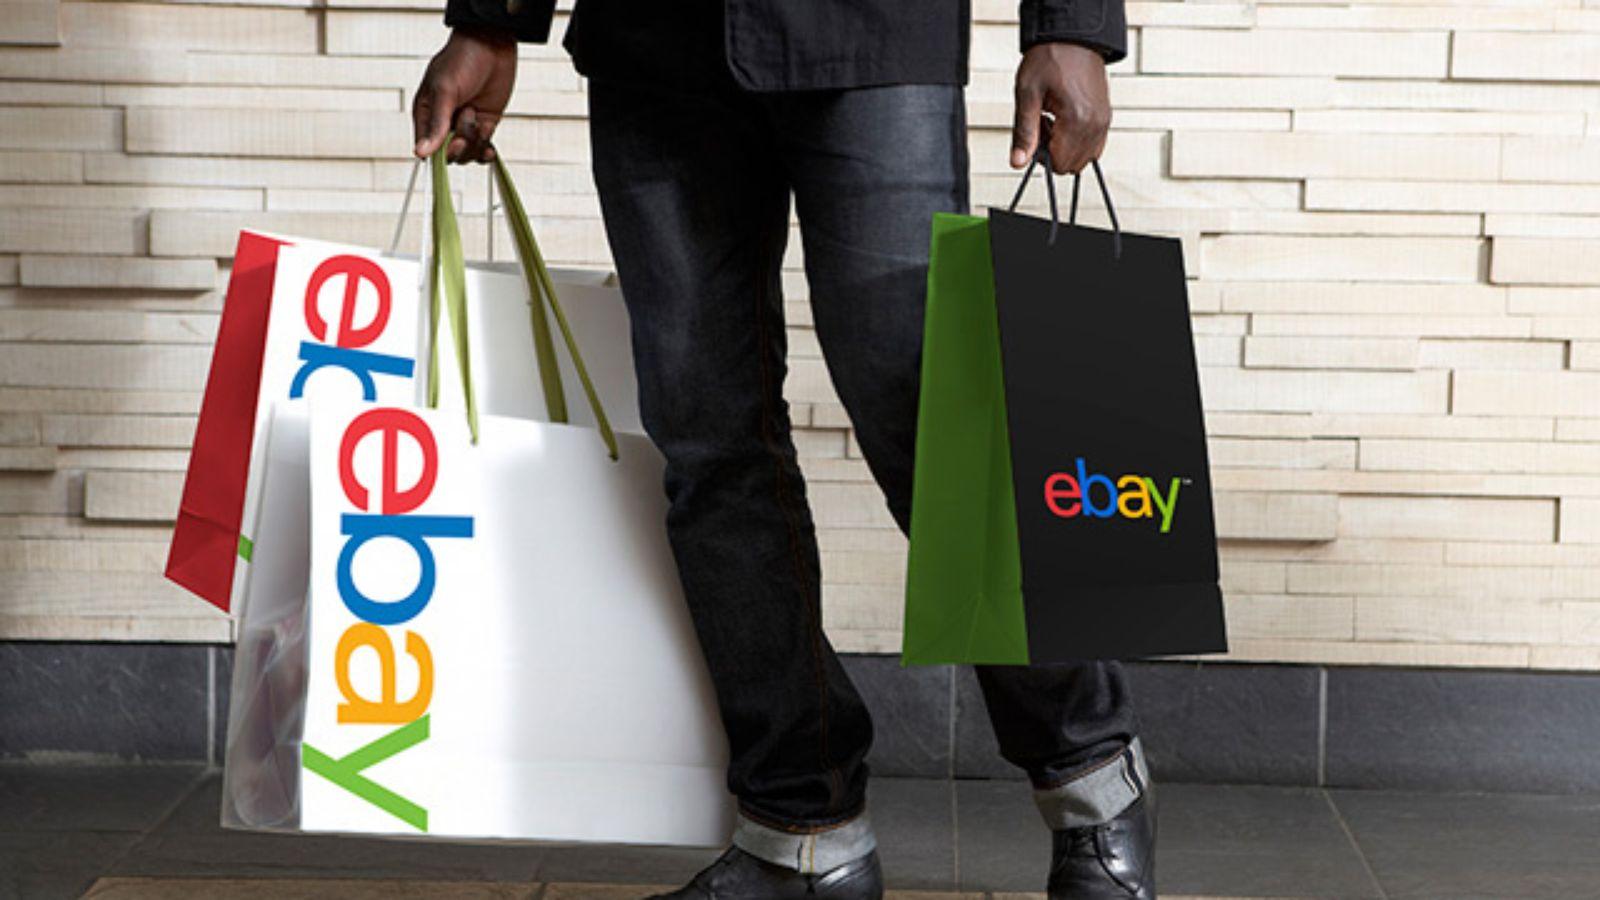 Review Barangan dari Dropshipper eBay